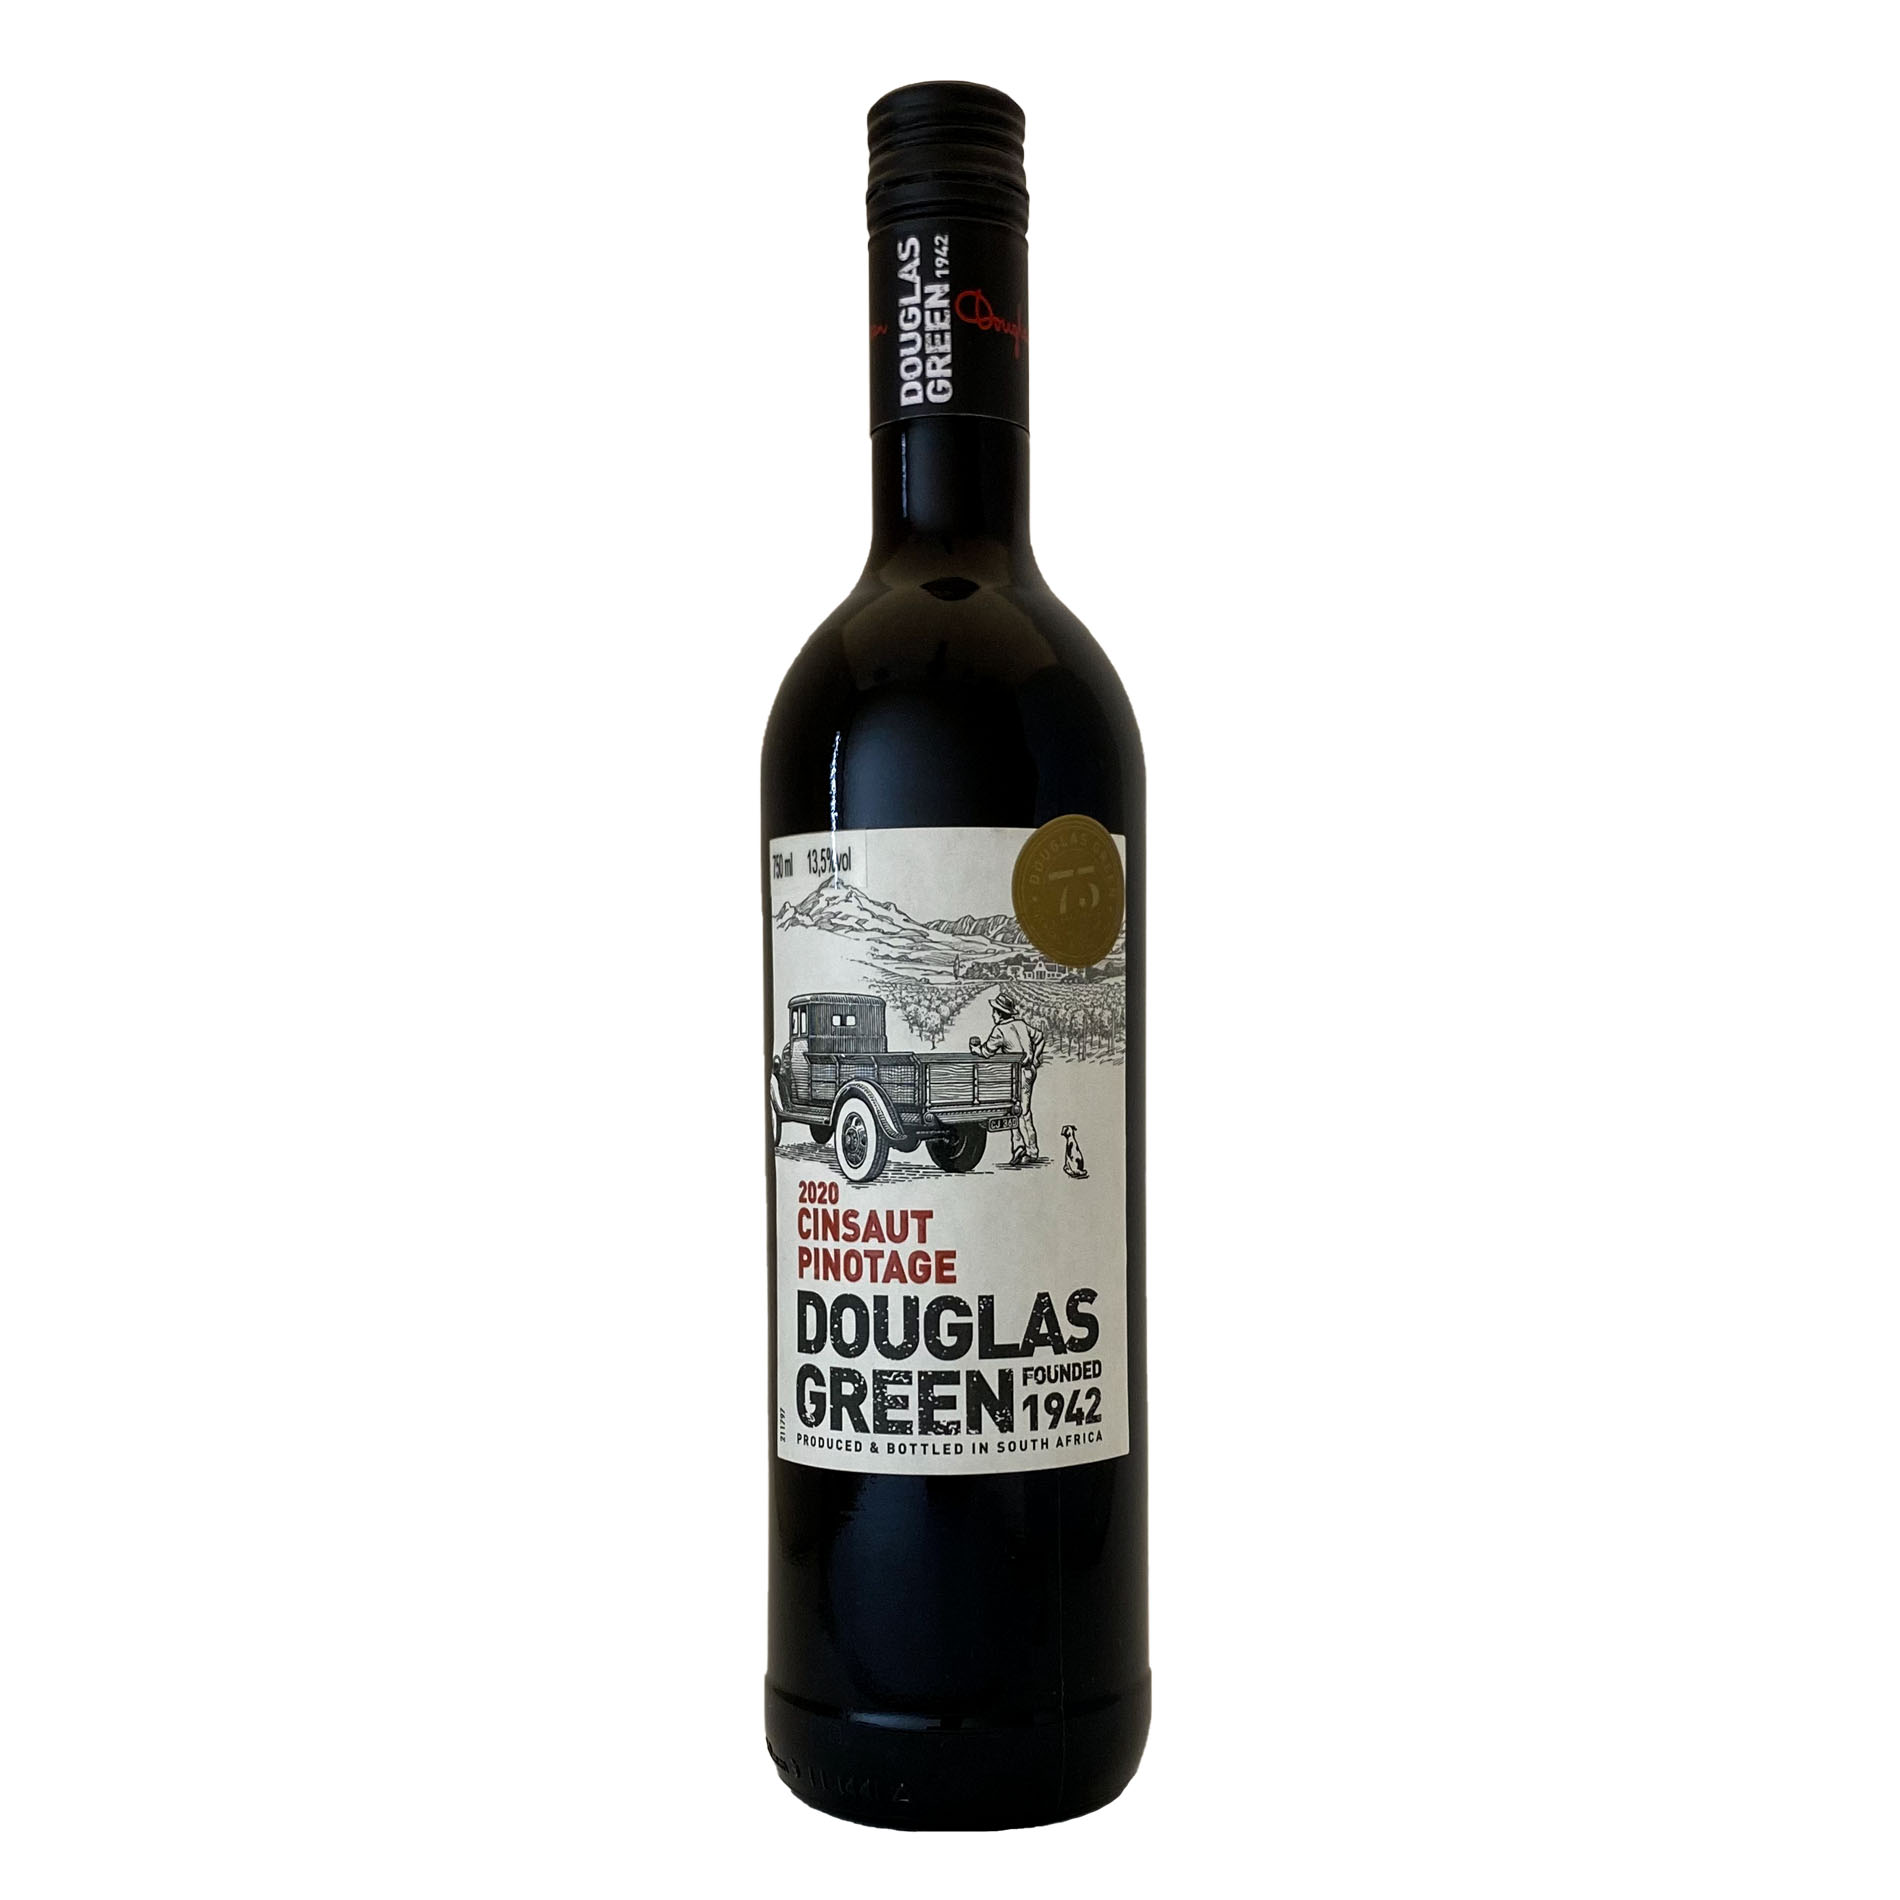 Douglas Green Pinotage / Cinsaut  - Vinerize